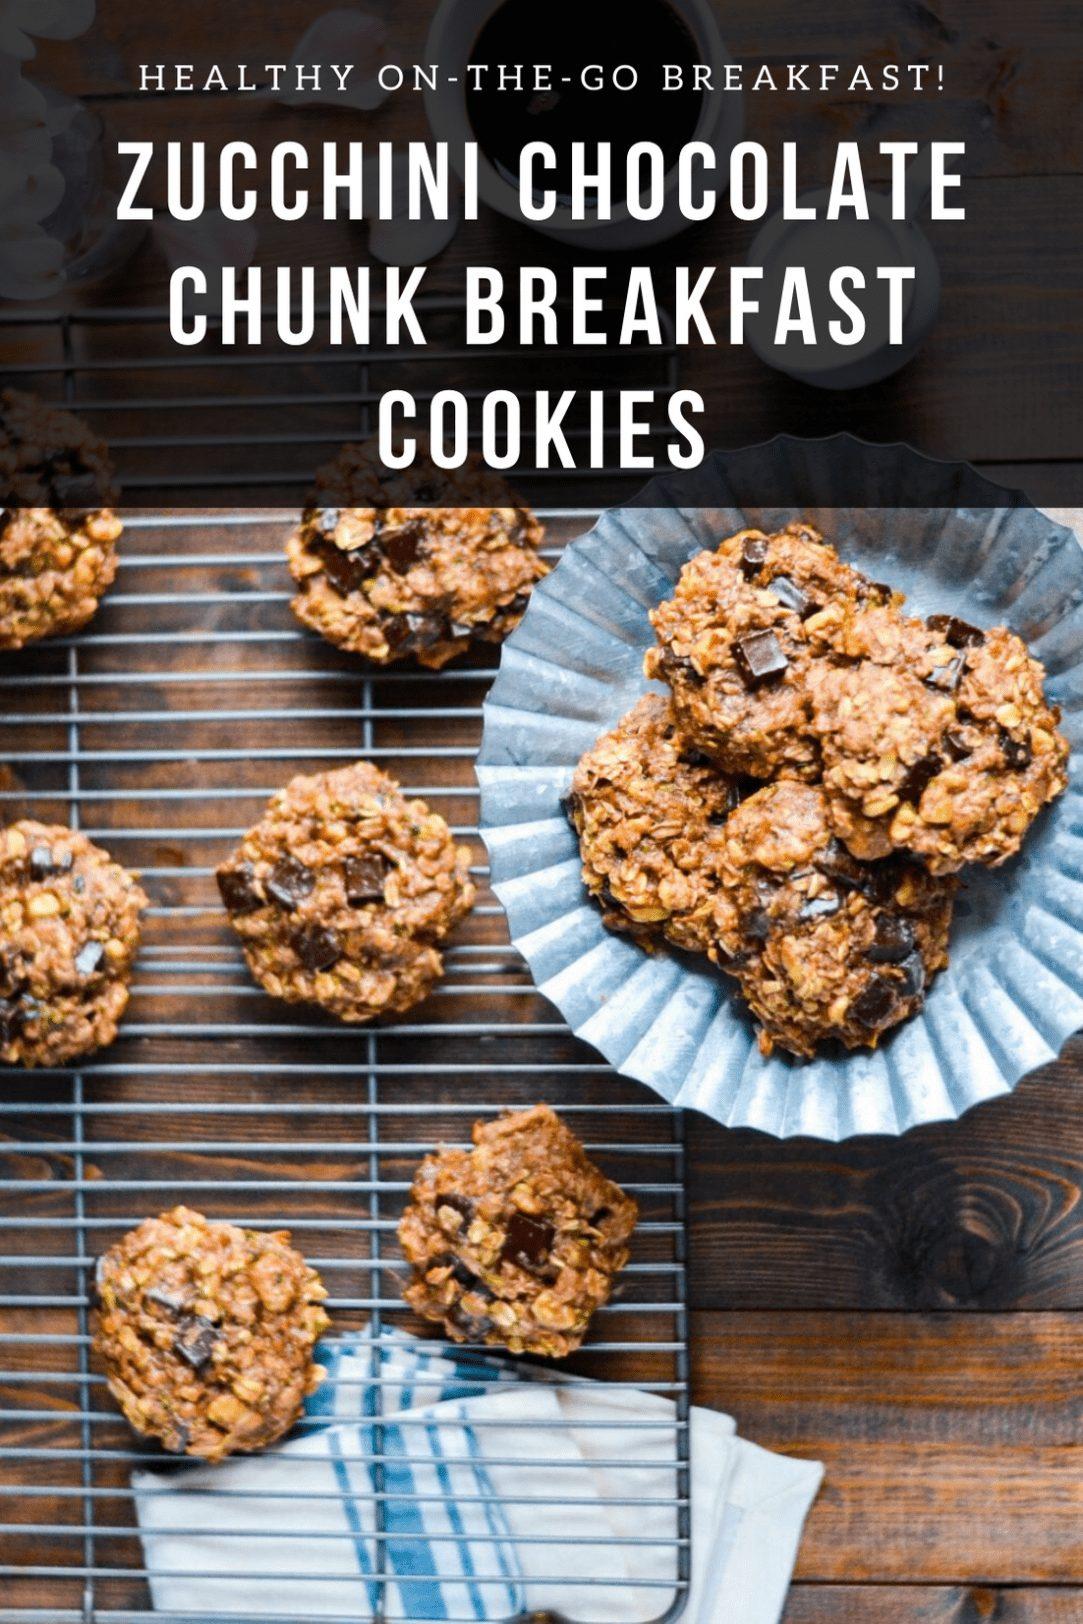 Zucchini Chocolate Chunk Breakfast Cookies on a cooking rack.